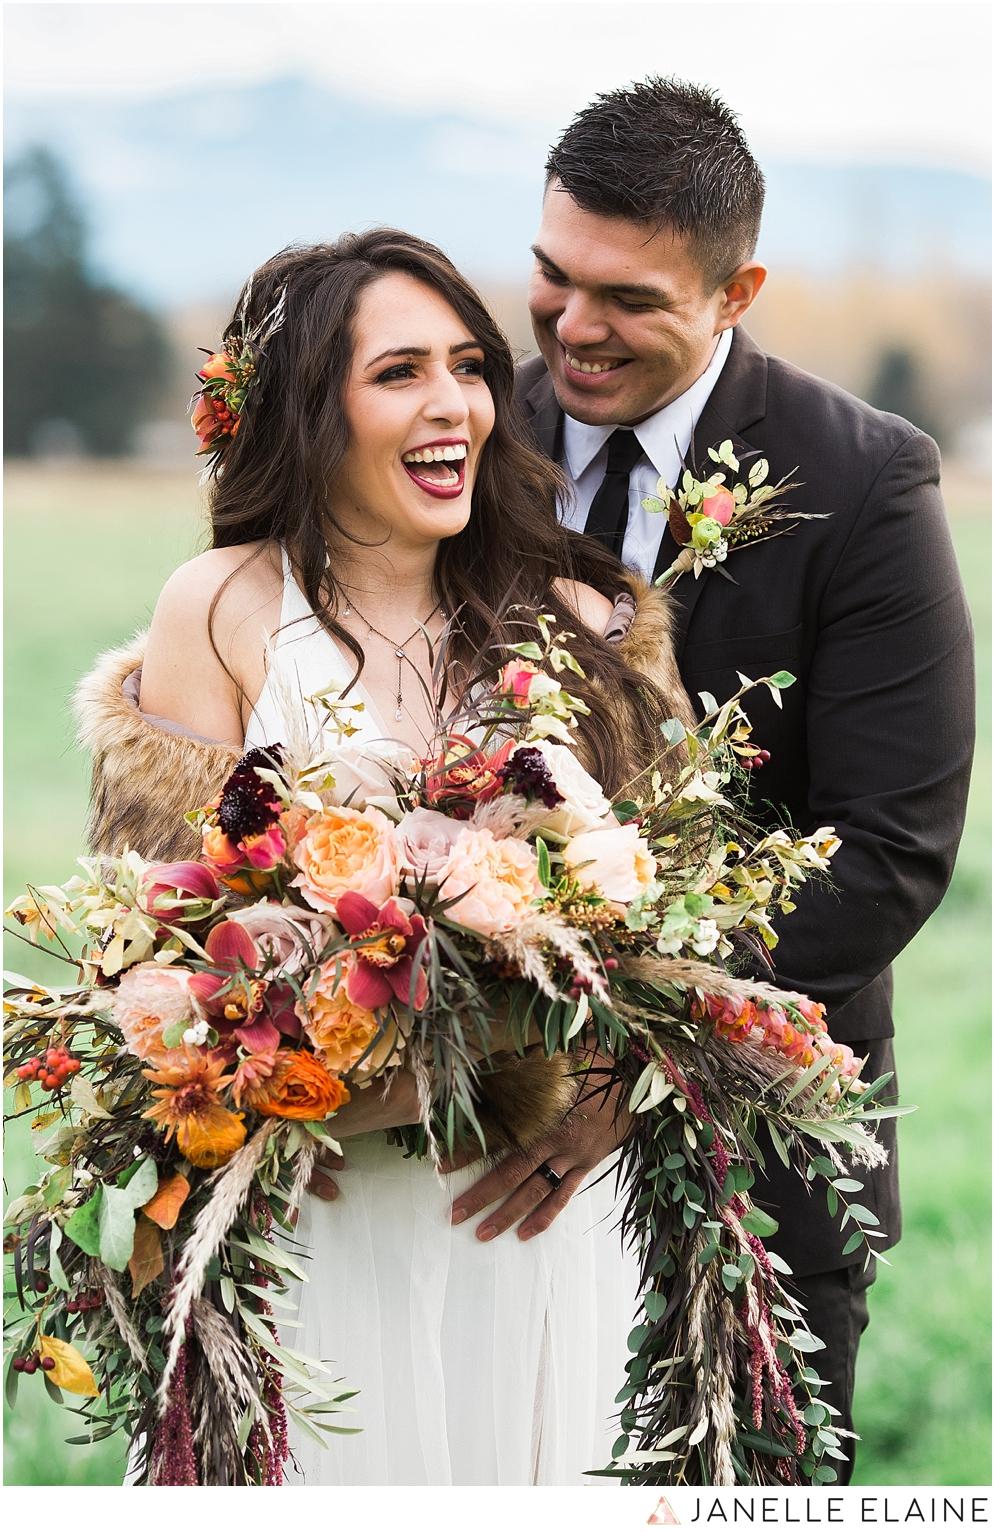 elopement-wedding-photographer-seattle washington-photographers-40.jpg